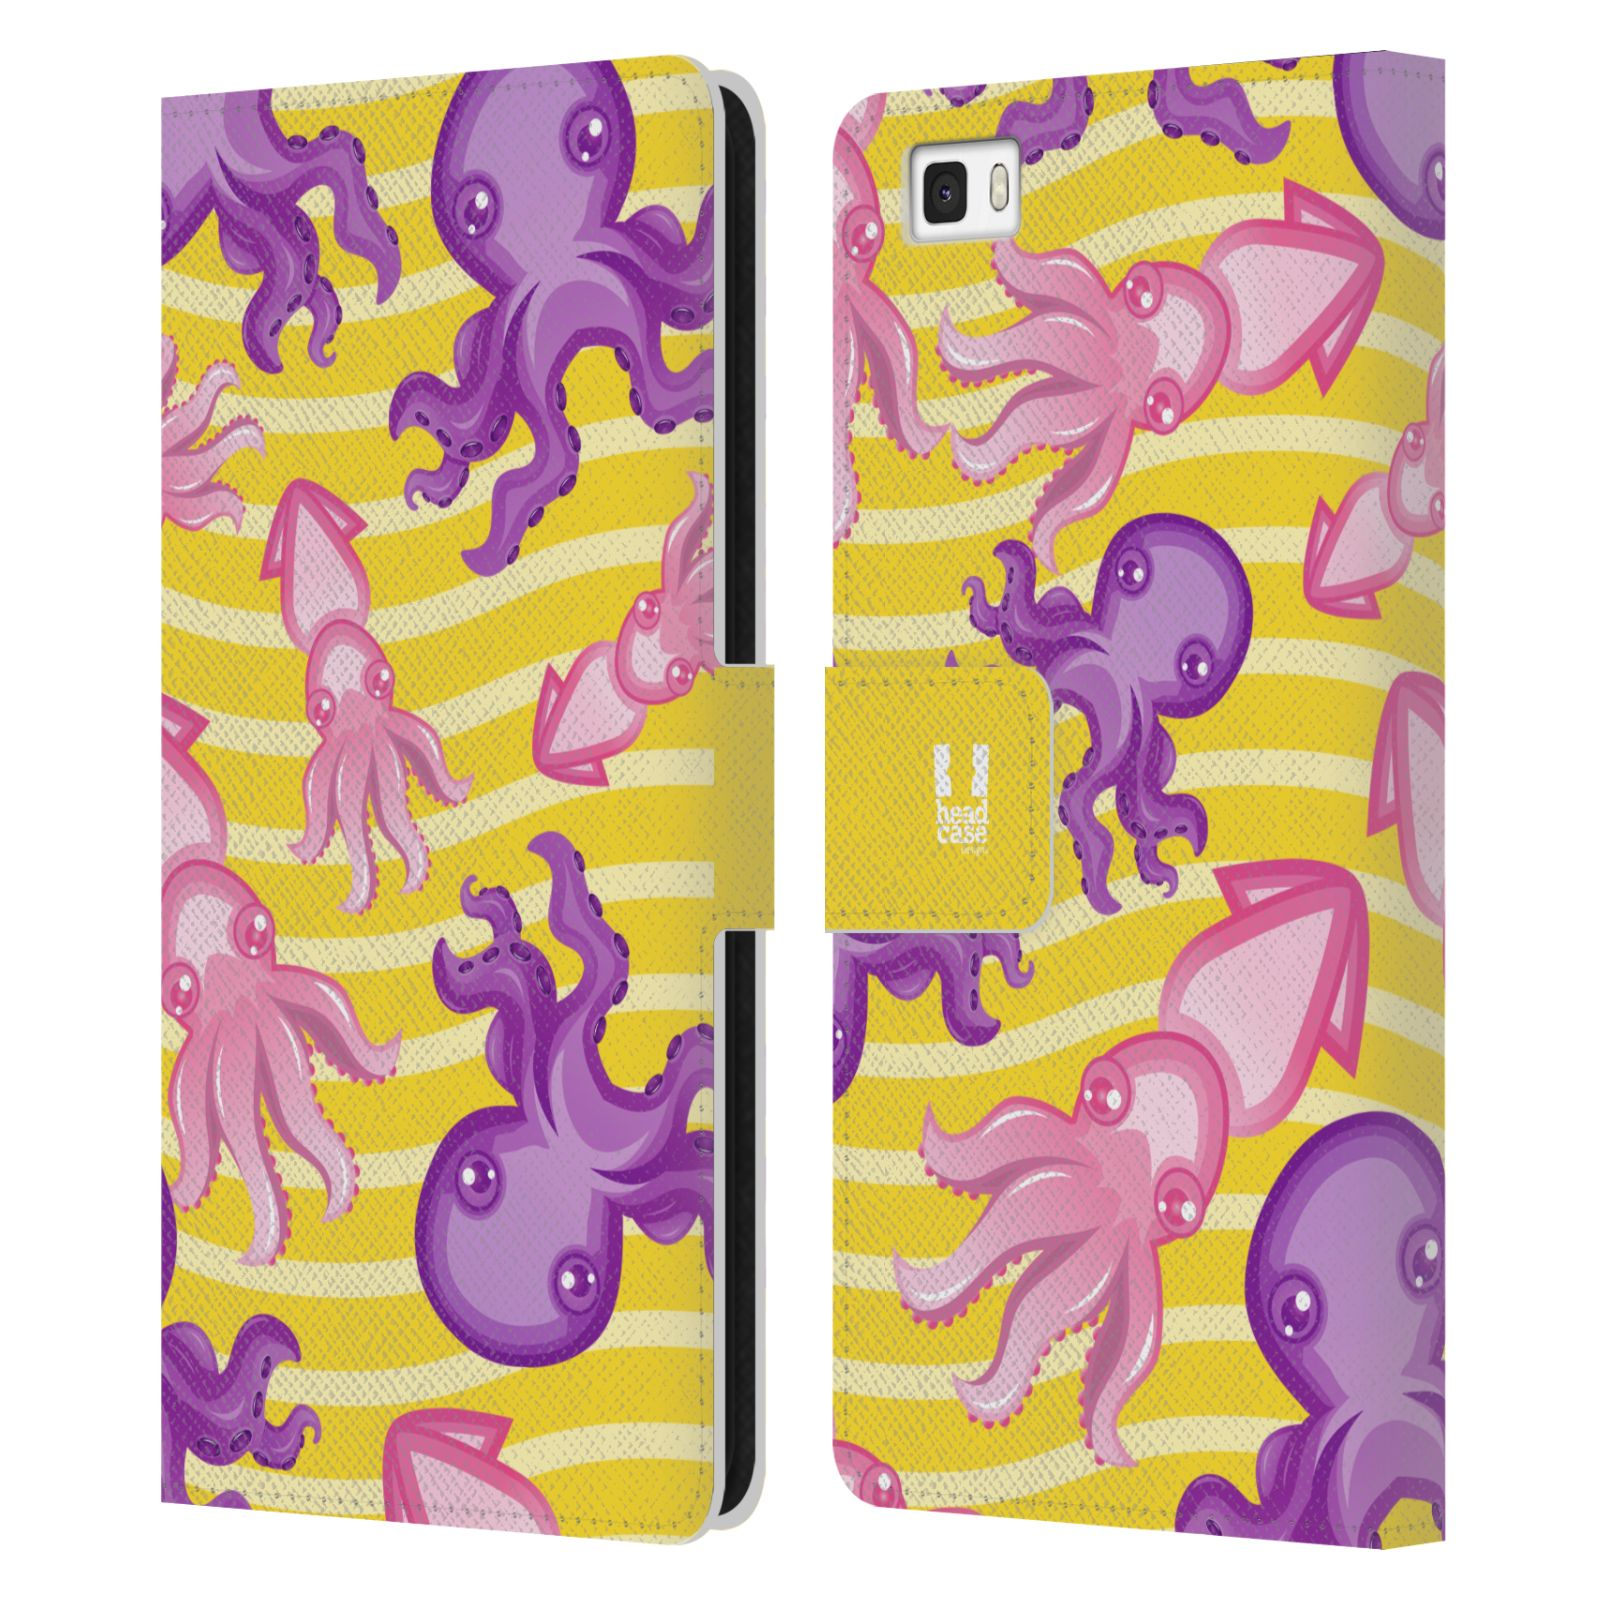 HEAD CASE Flipové pouzdro pro mobil Huawei P8 LITE Mořský živočich chobotnice a krakatice žlutá barva